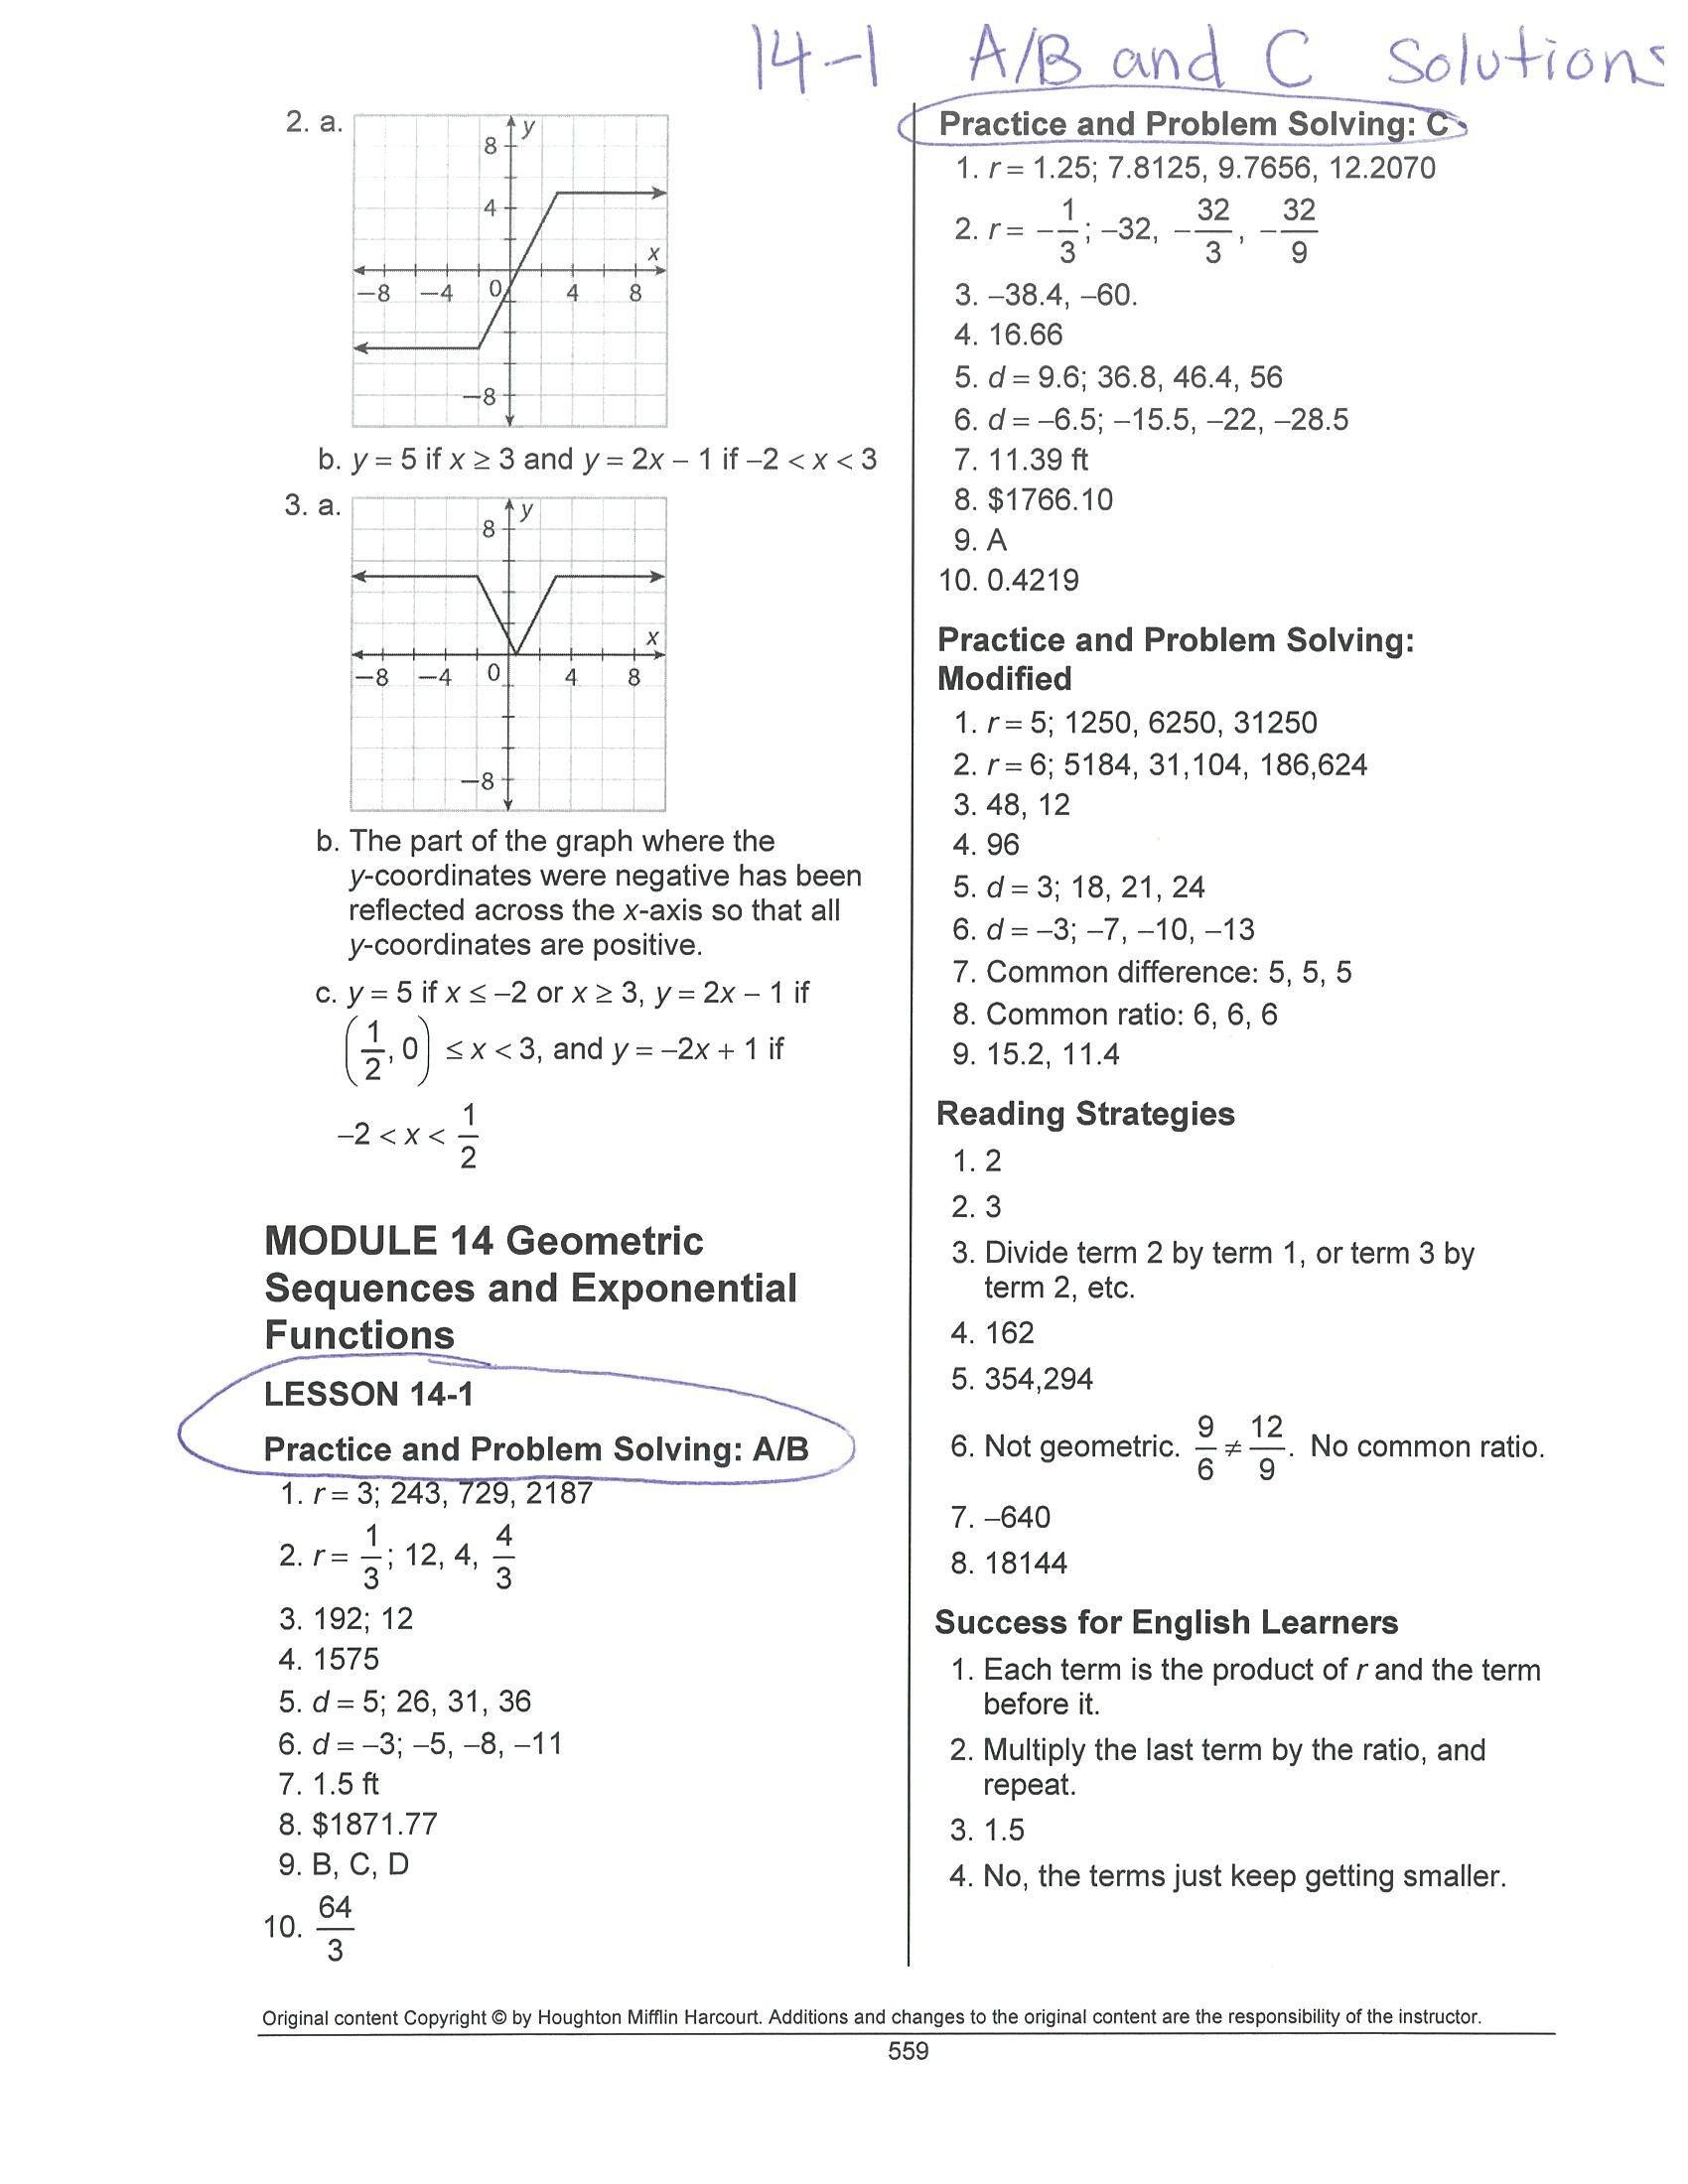 Probability Theory Worksheet 1